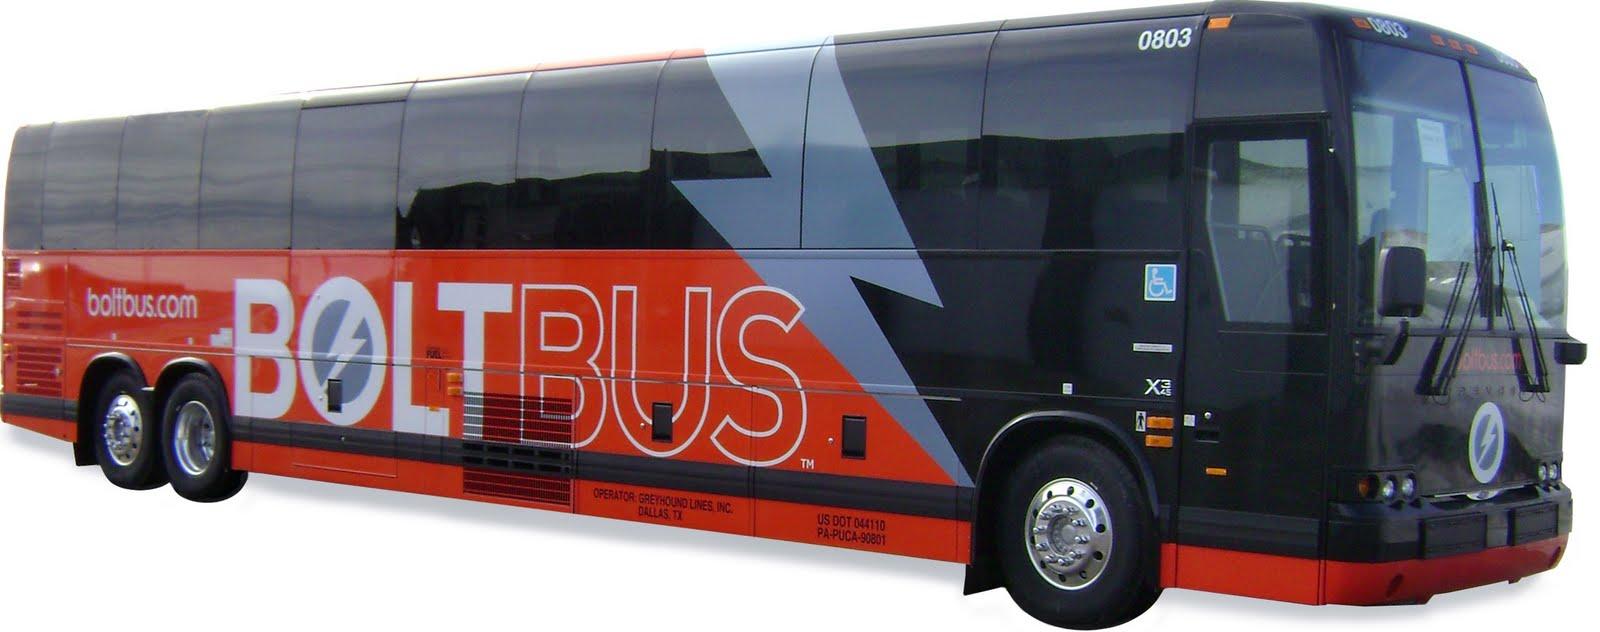 Cheap Bus New York To Rhode Island